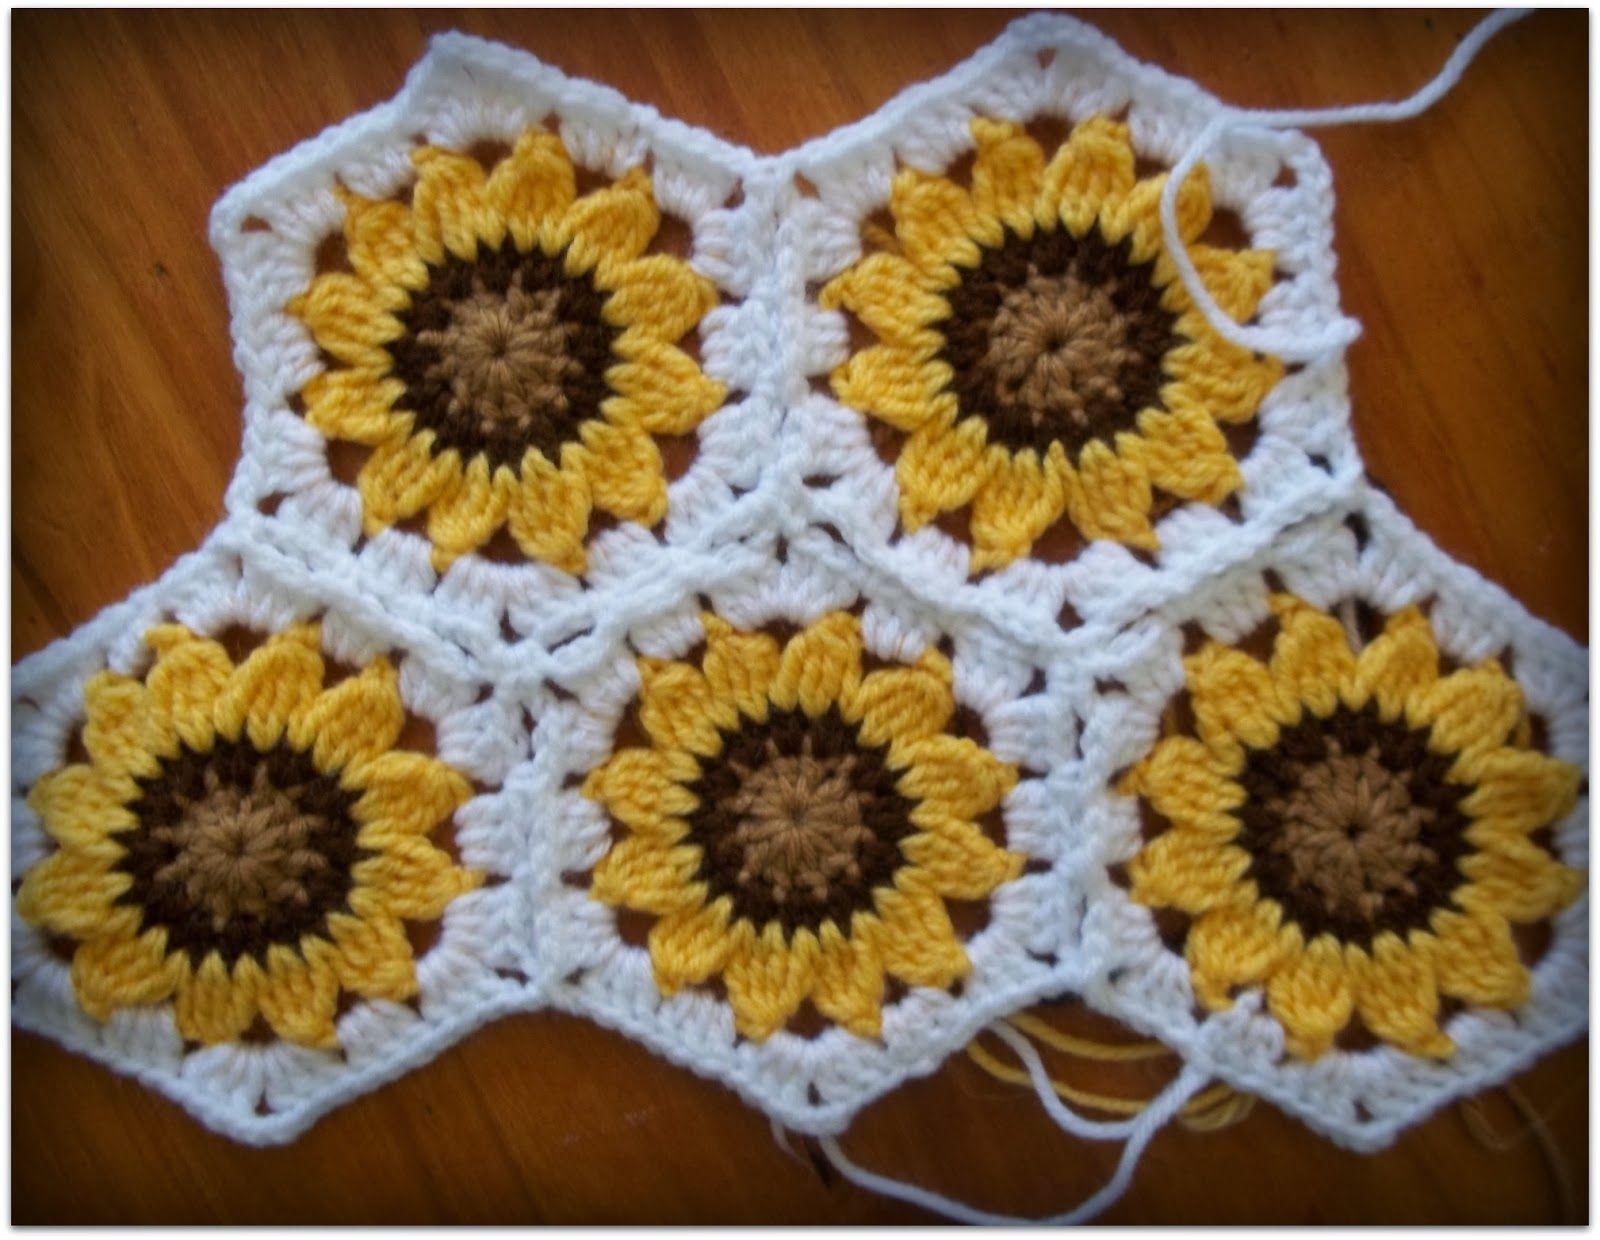 Pin By Nadine Nasypany On Craft Ideas Crochet Hexagon Blanket Crochet Sunflower Crochet Hexagon